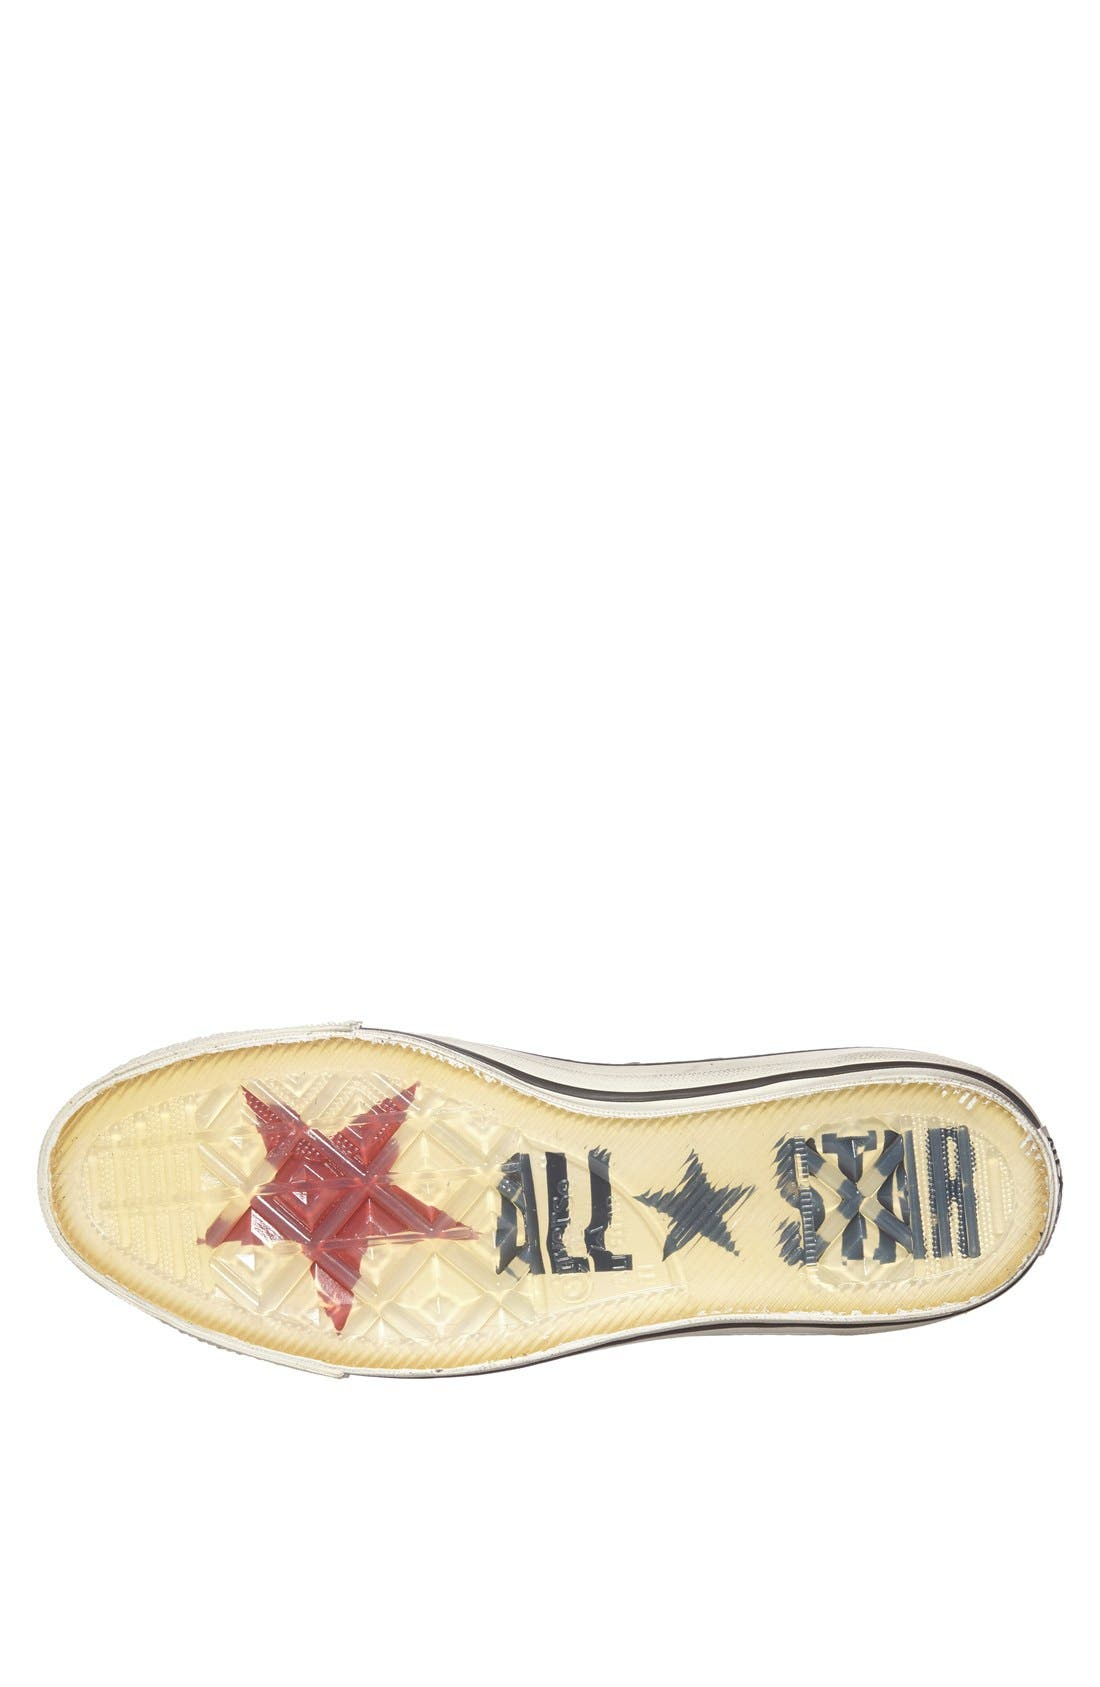 Alternate Image 4  - Converse by John Varvatos Chuck Taylor® All Star® Sneaker